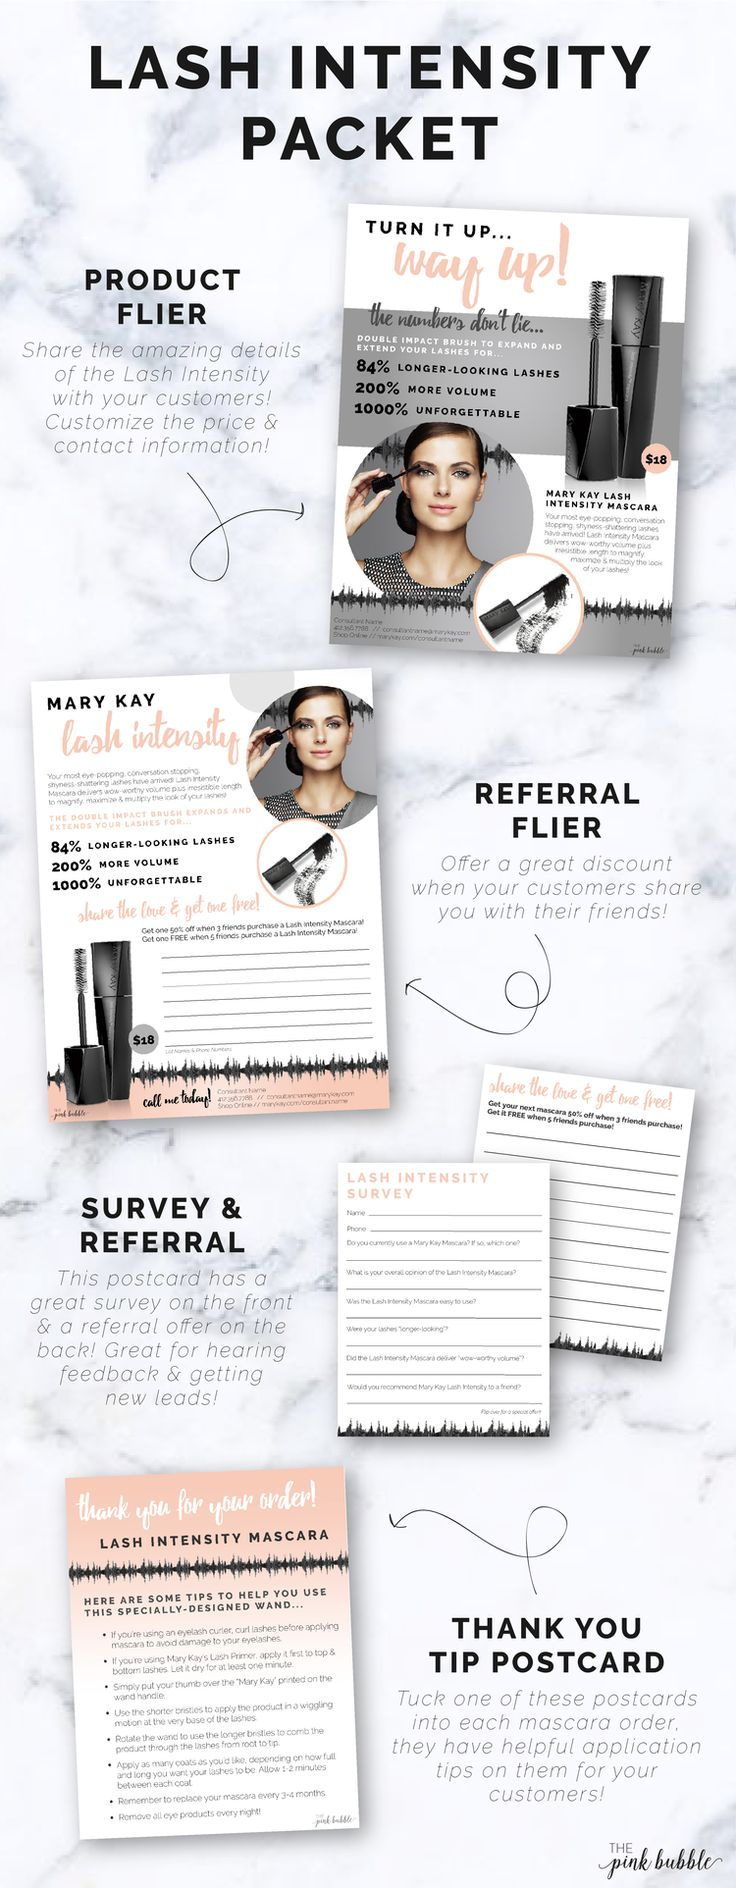 Mary Kay Lash Intensity Mascara Packet! Custom Product Flier, Custom  Referral Flier, Survey